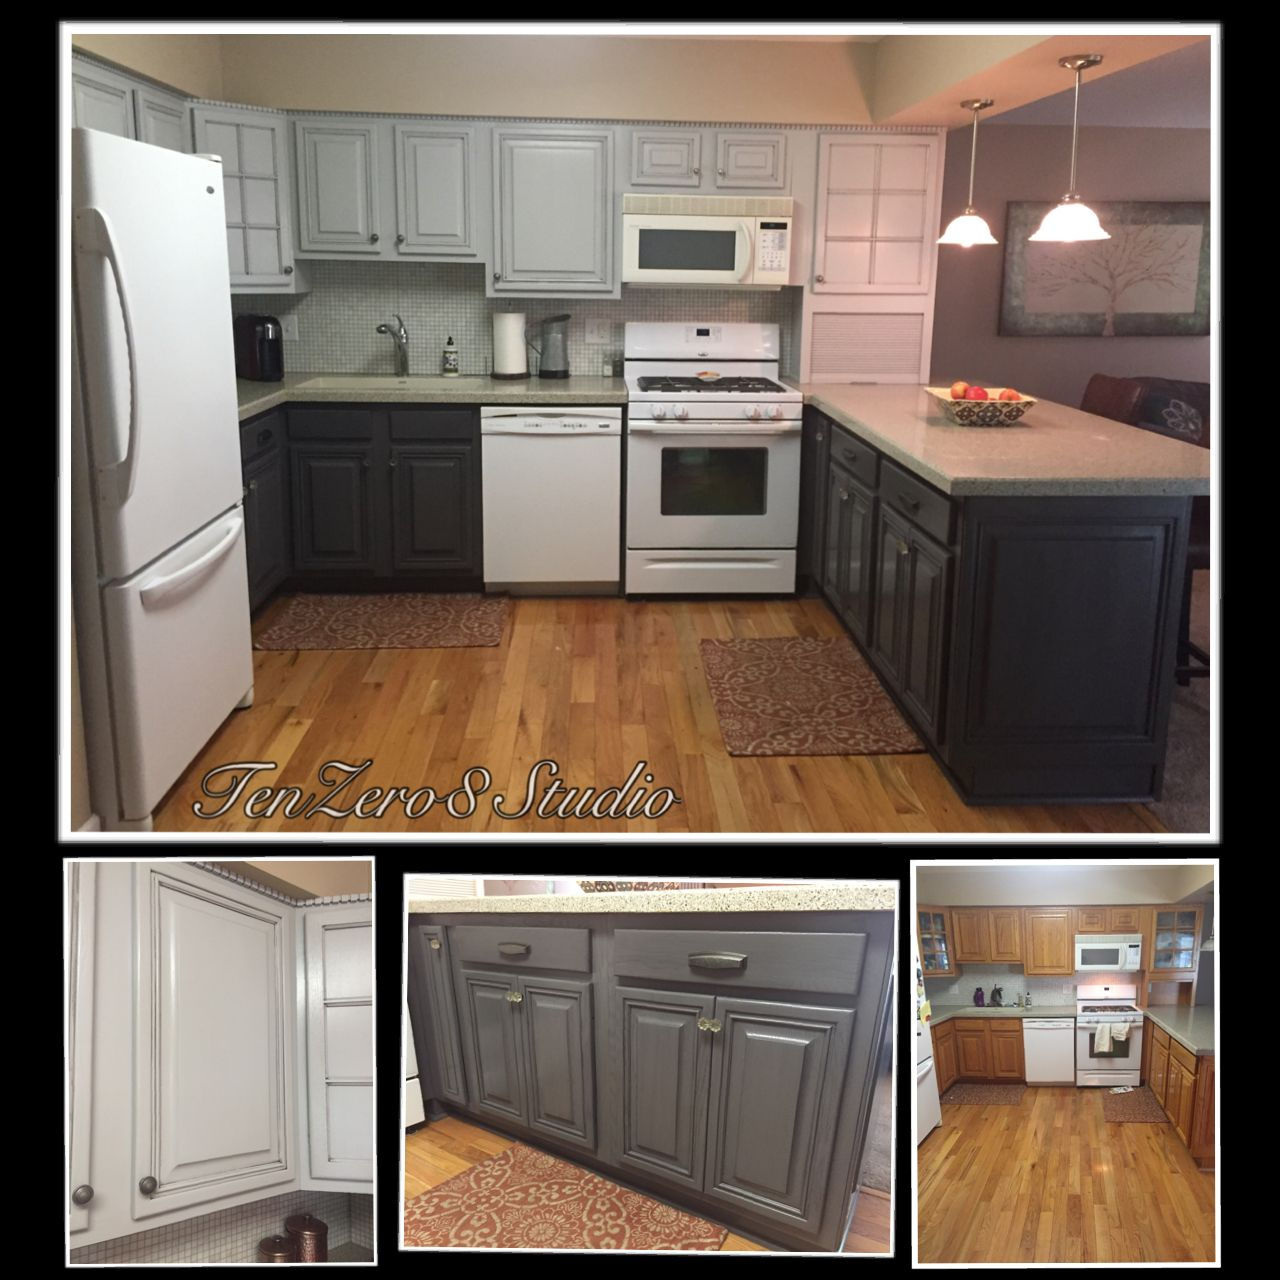 Best Kitchen By Tenzero8 Studio In General Finishes Seagull 400 x 300